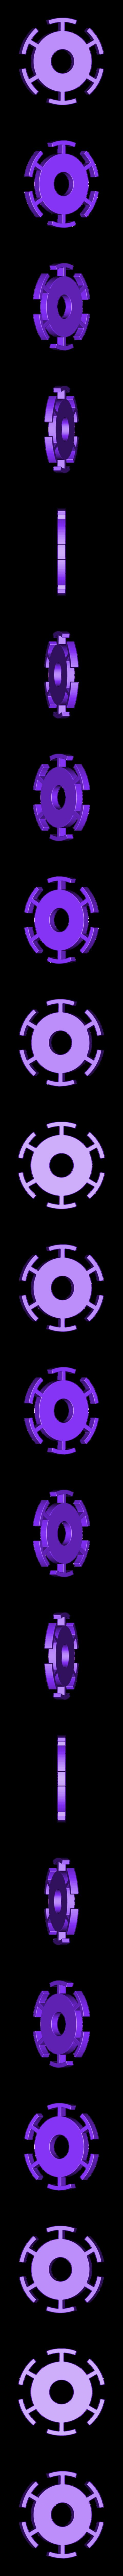 centre.stl Download STL file Hand Spinner Watchmen • 3D printer model, Guich